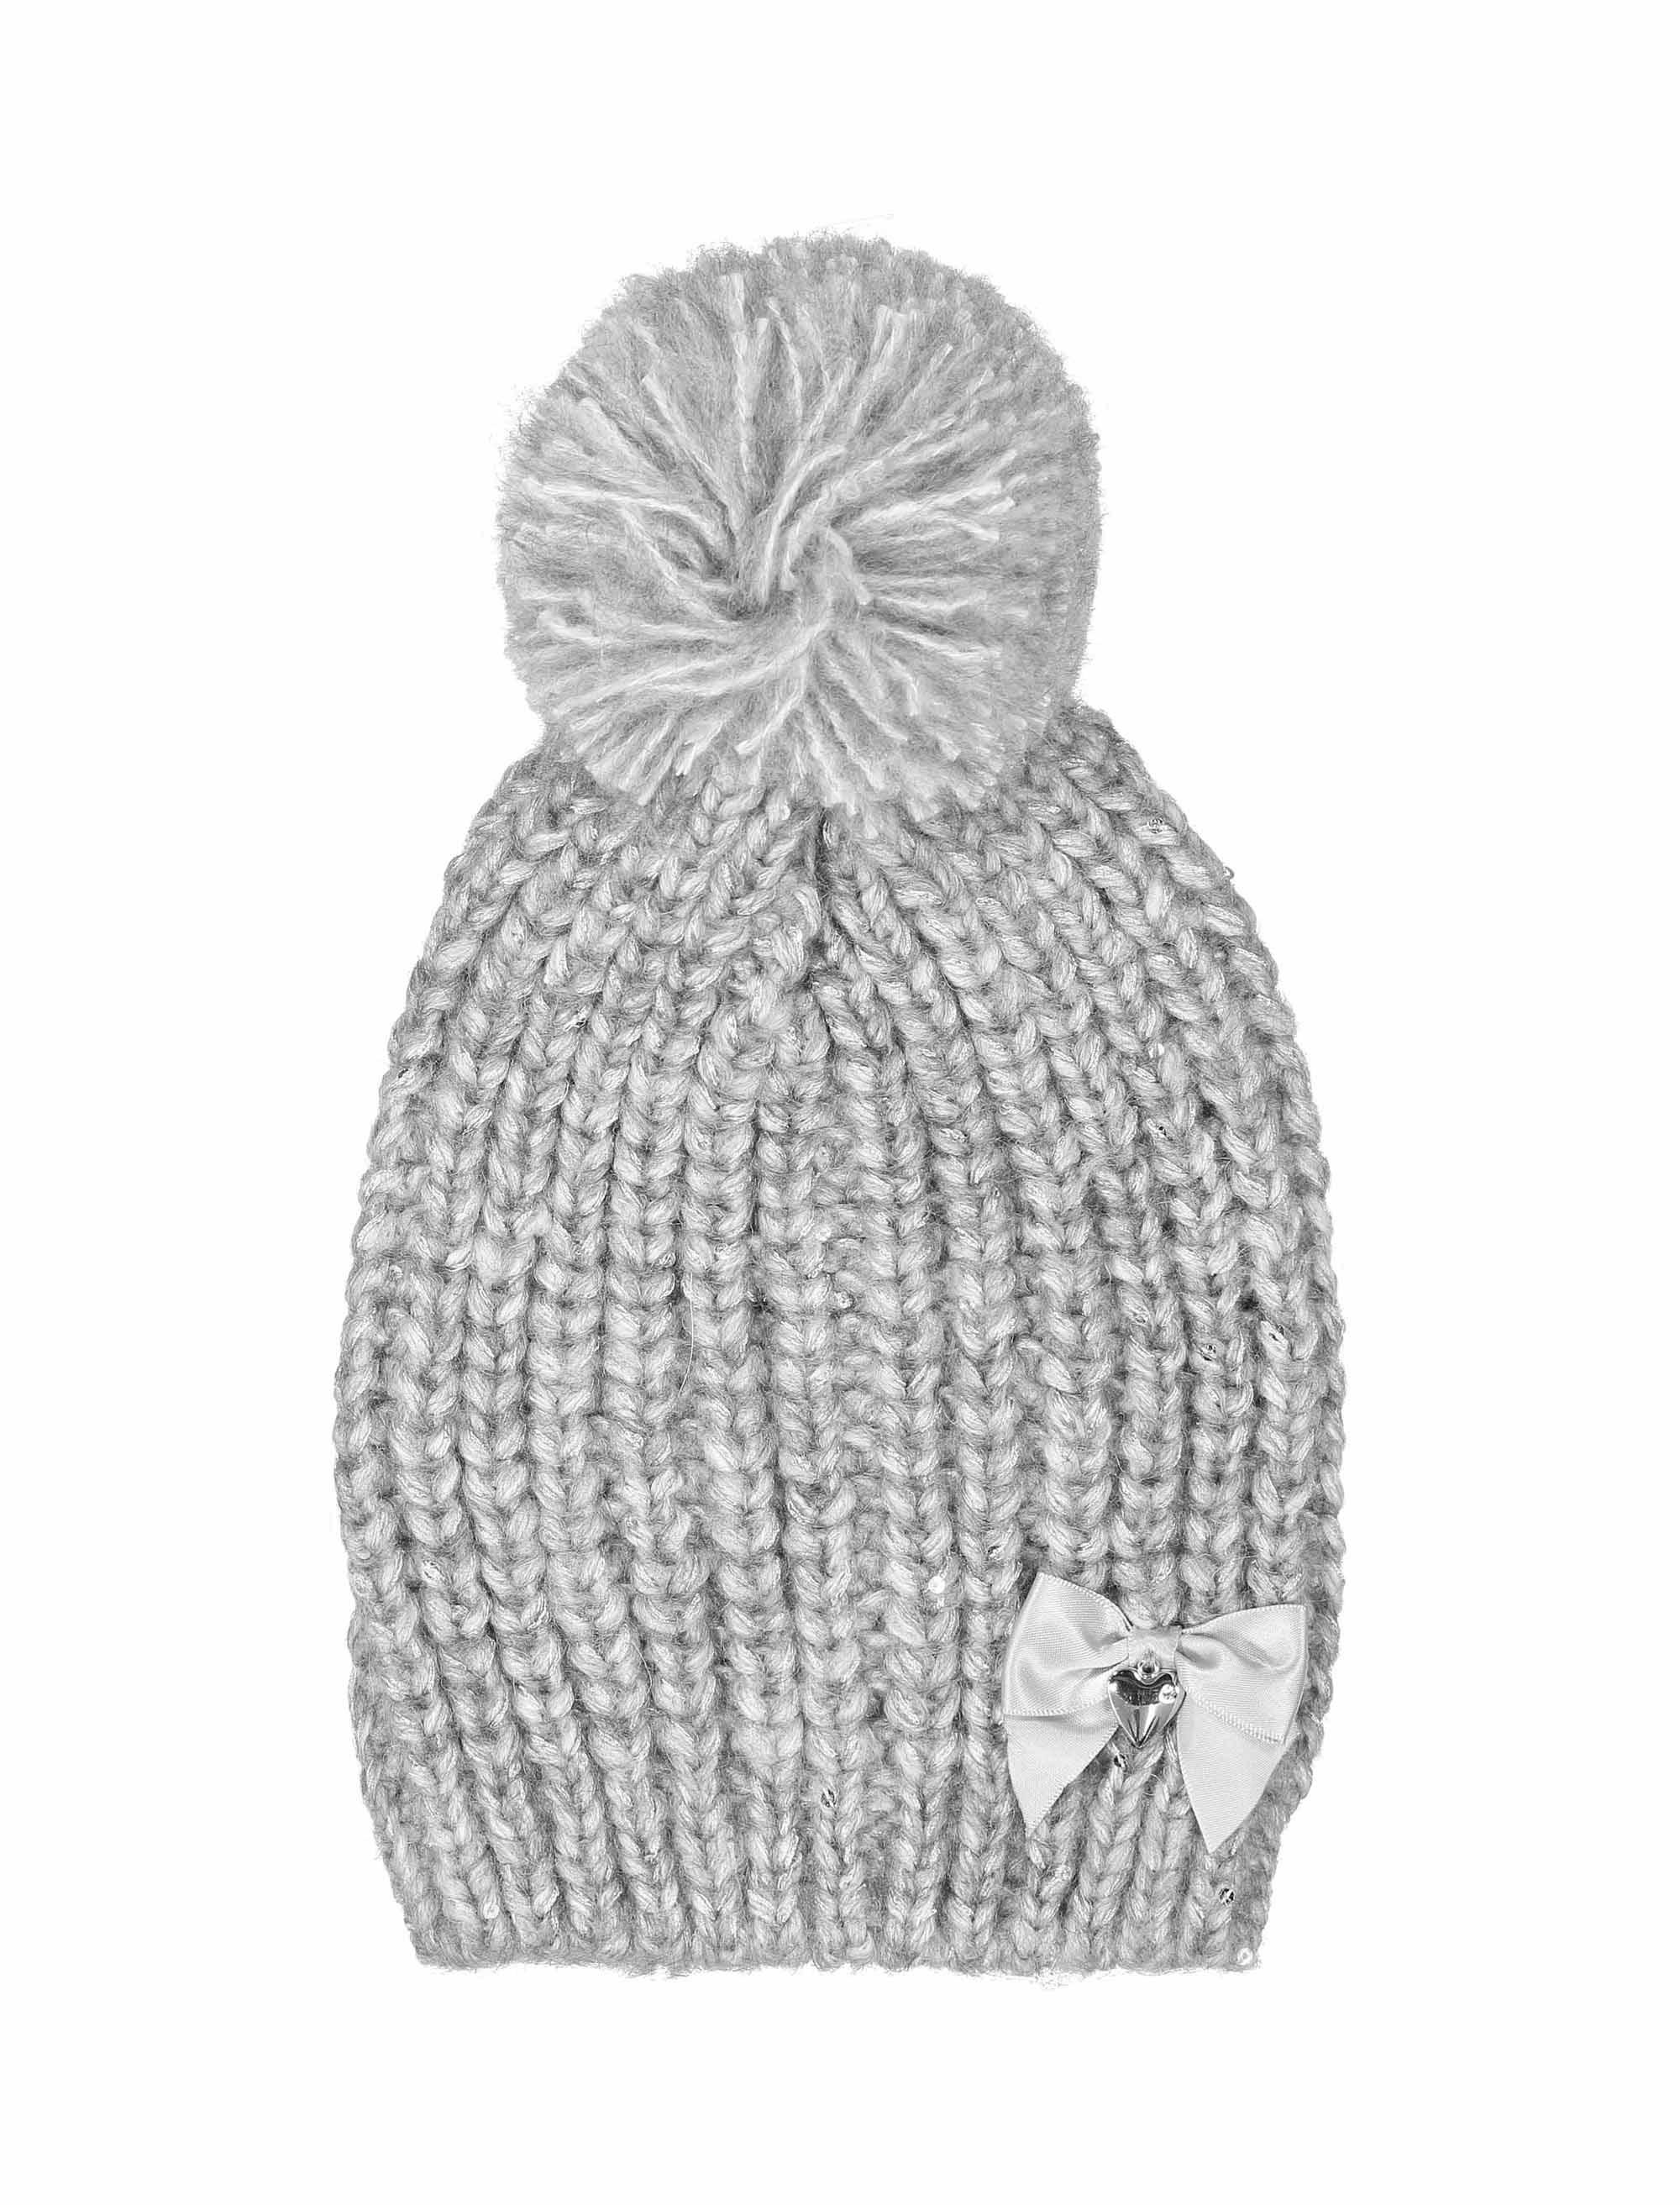 کلاه بافتنی نوزادی دخترانه - ایدکس - طوسي - 1